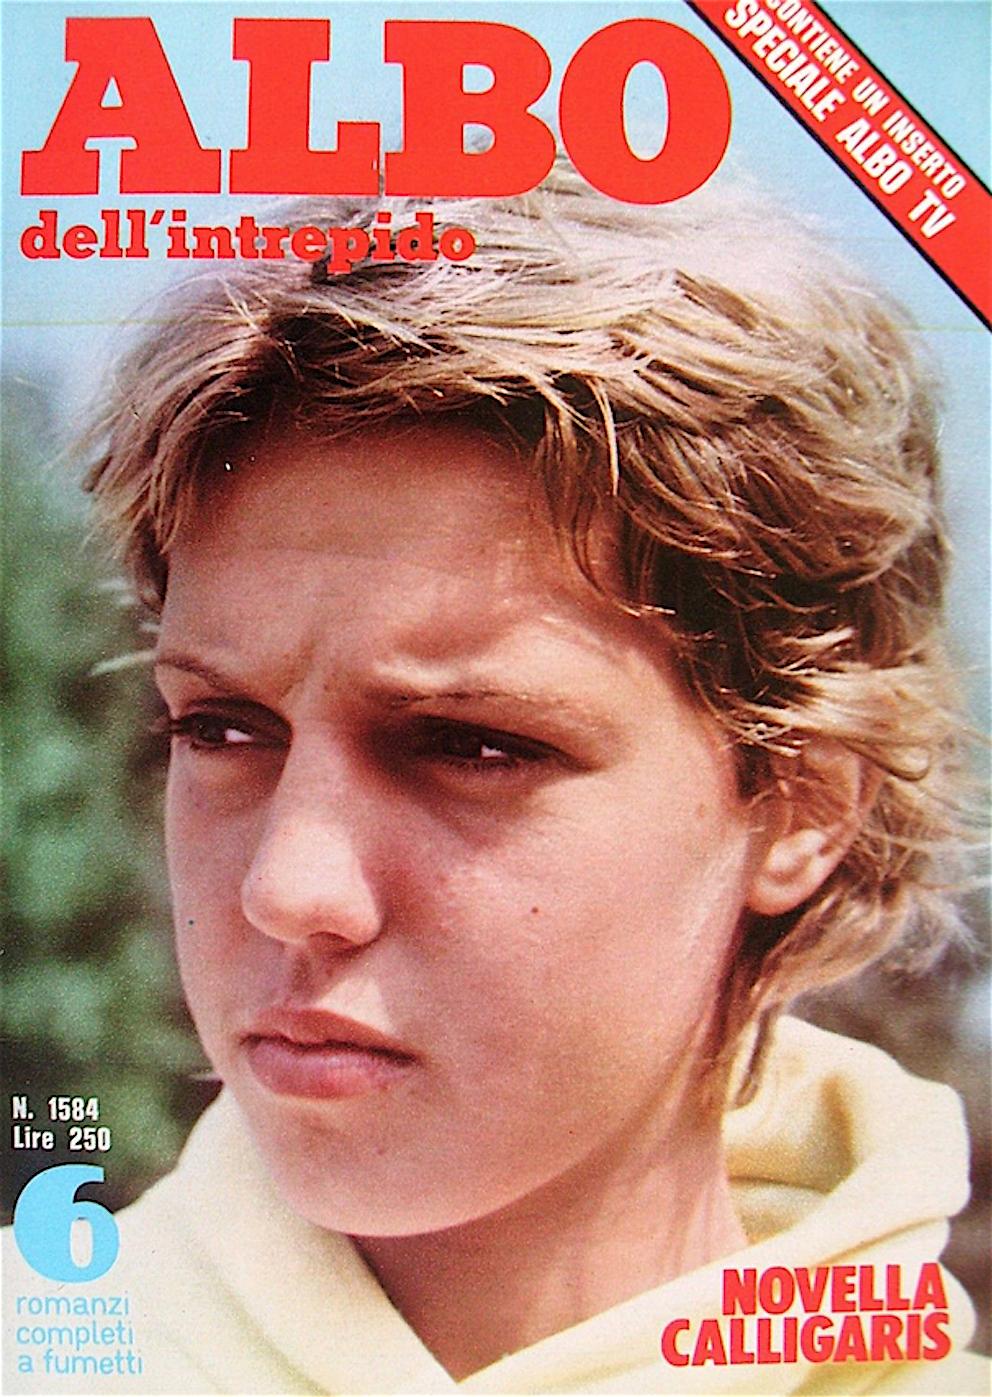 novella_galligaris_copertina_anni_70